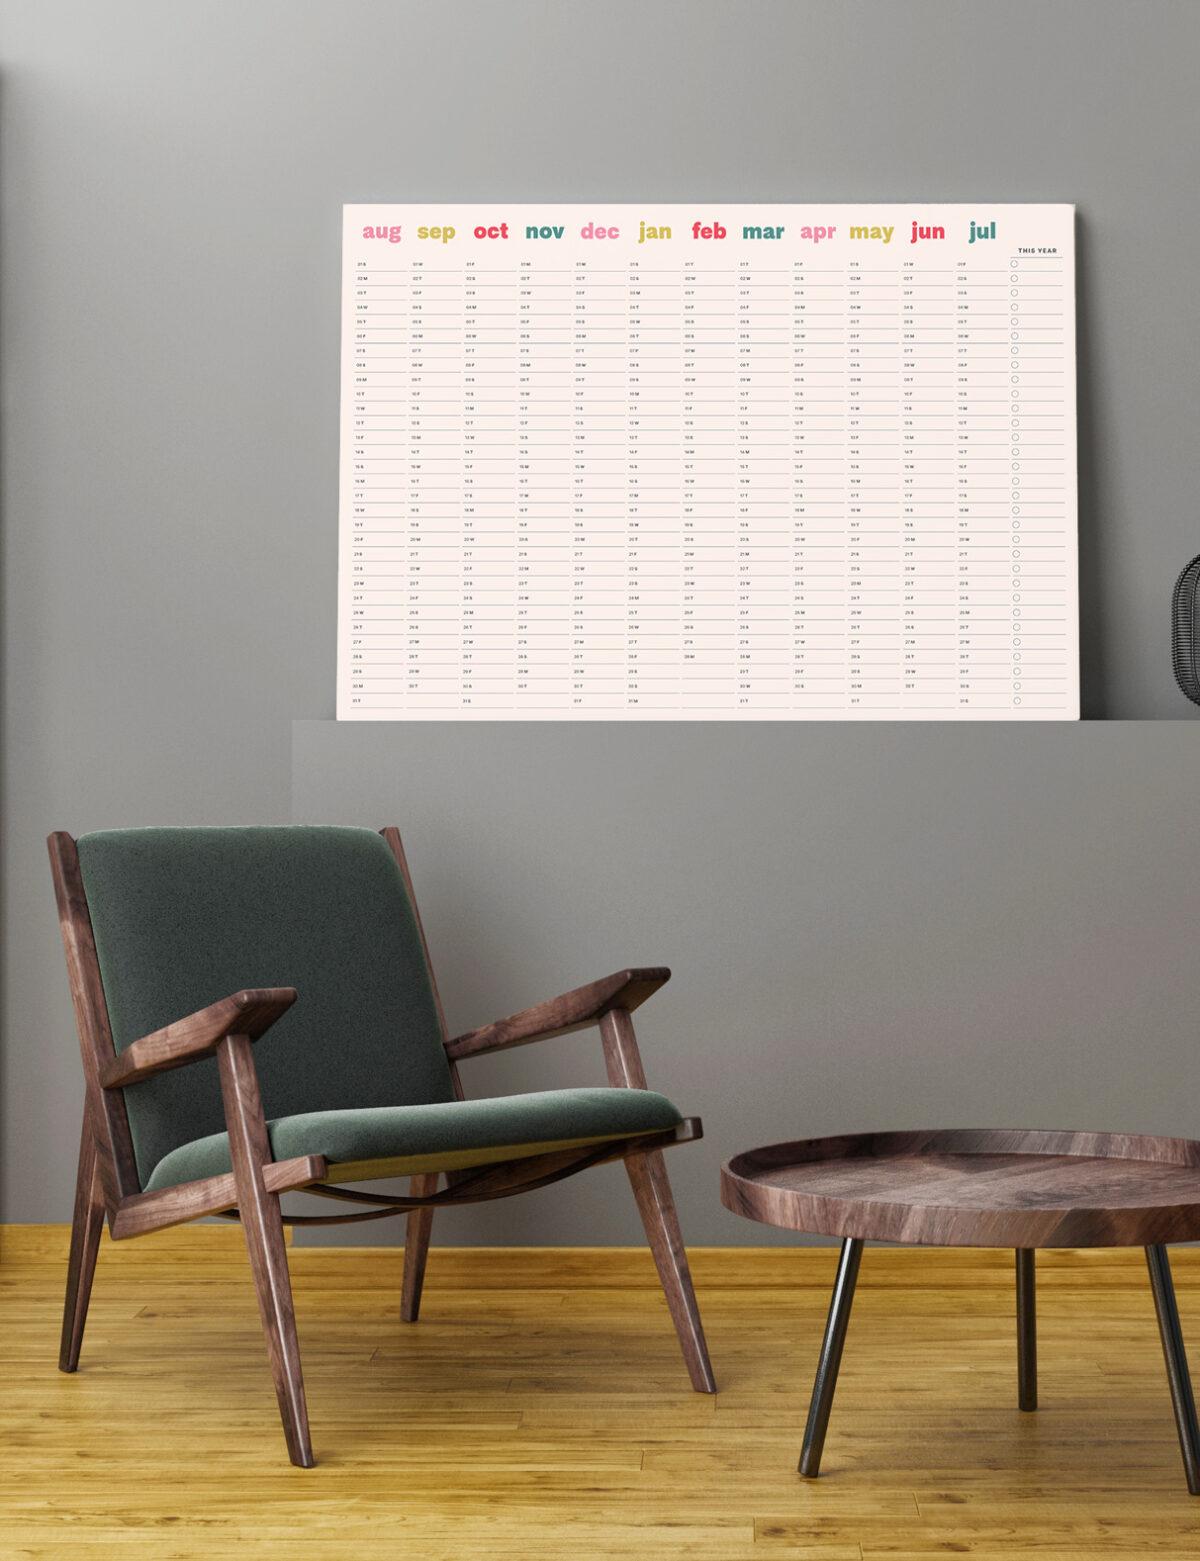 2021-2022 Mid-Year Wall Planner, Wall Calendar, Minimal Beige Wall